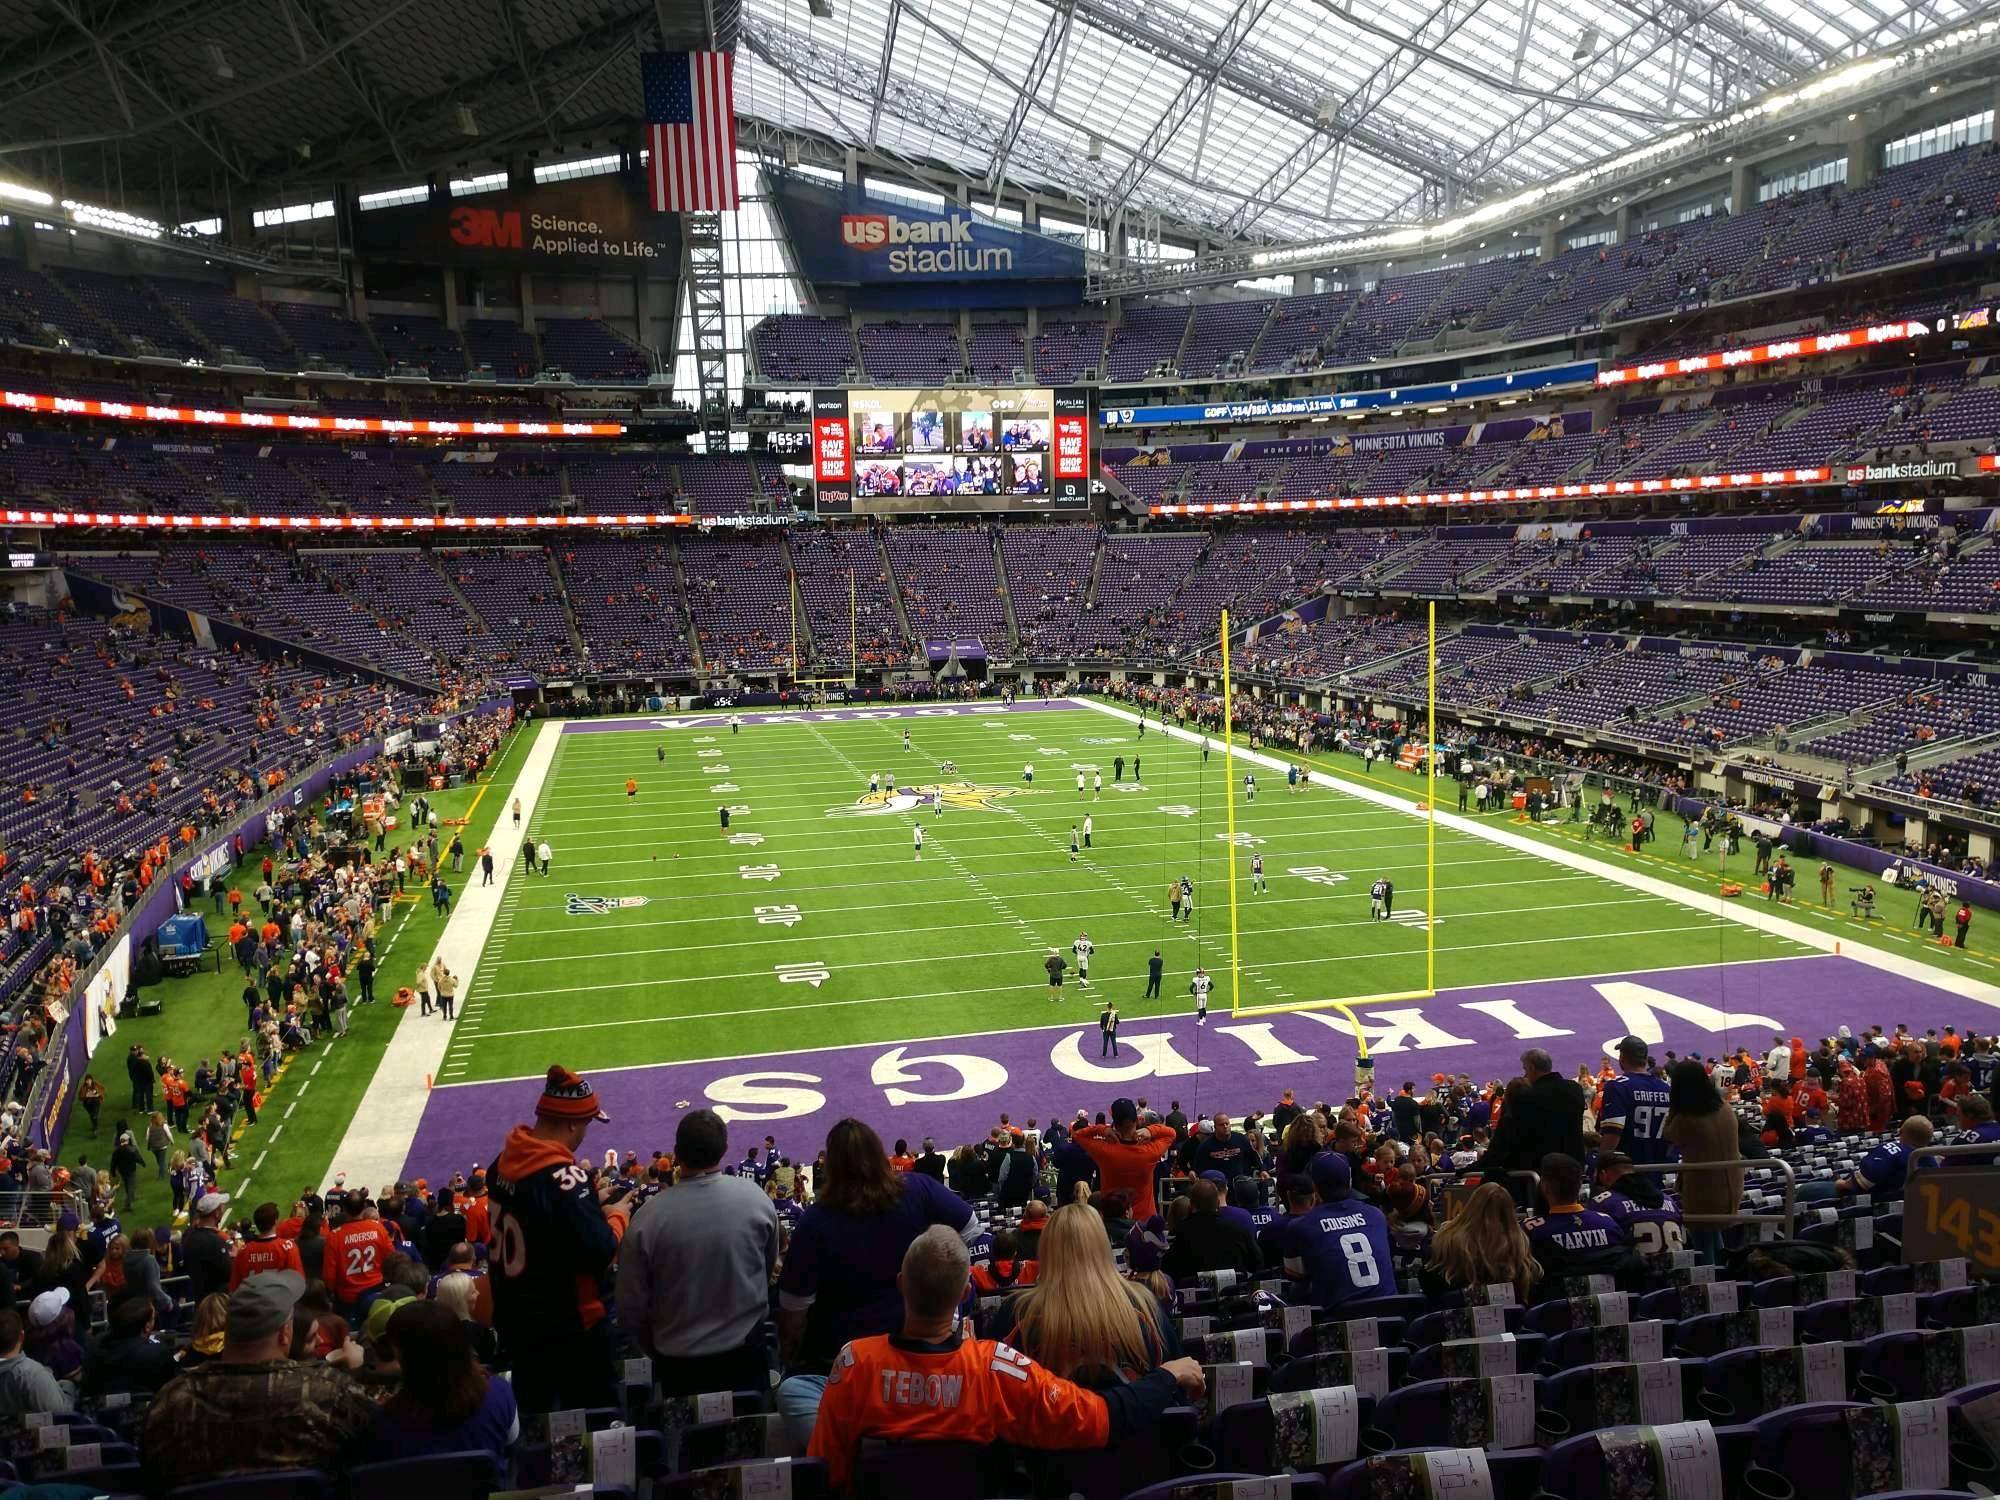 U.S. Bank Stadium Section 143 Row 36 Seat 11